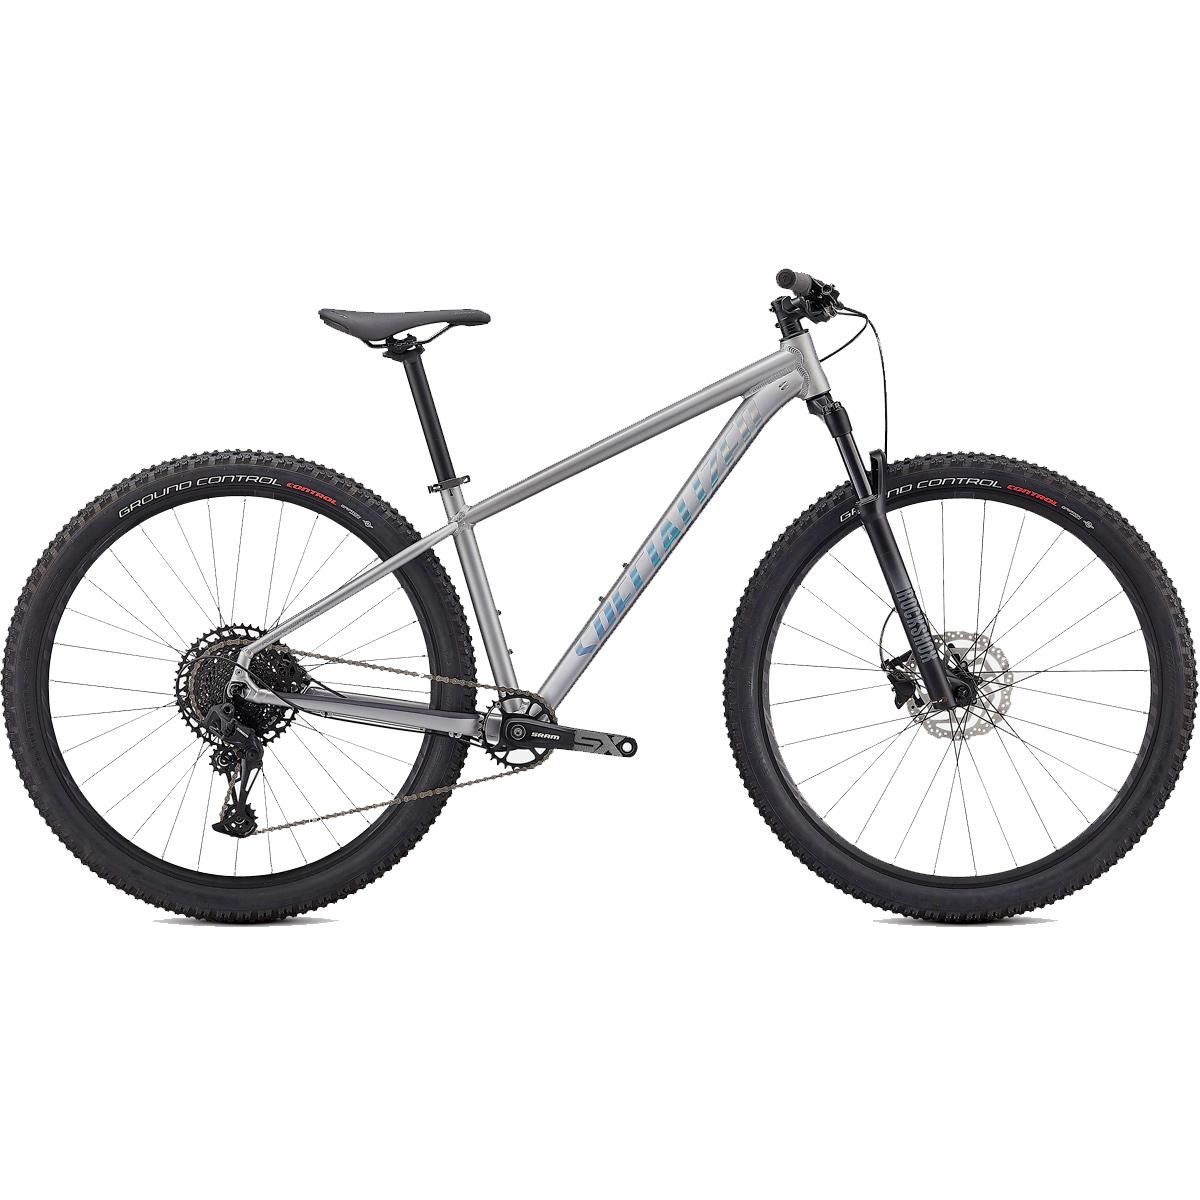 Bicicleta Specialized Rockhopper Expert 29